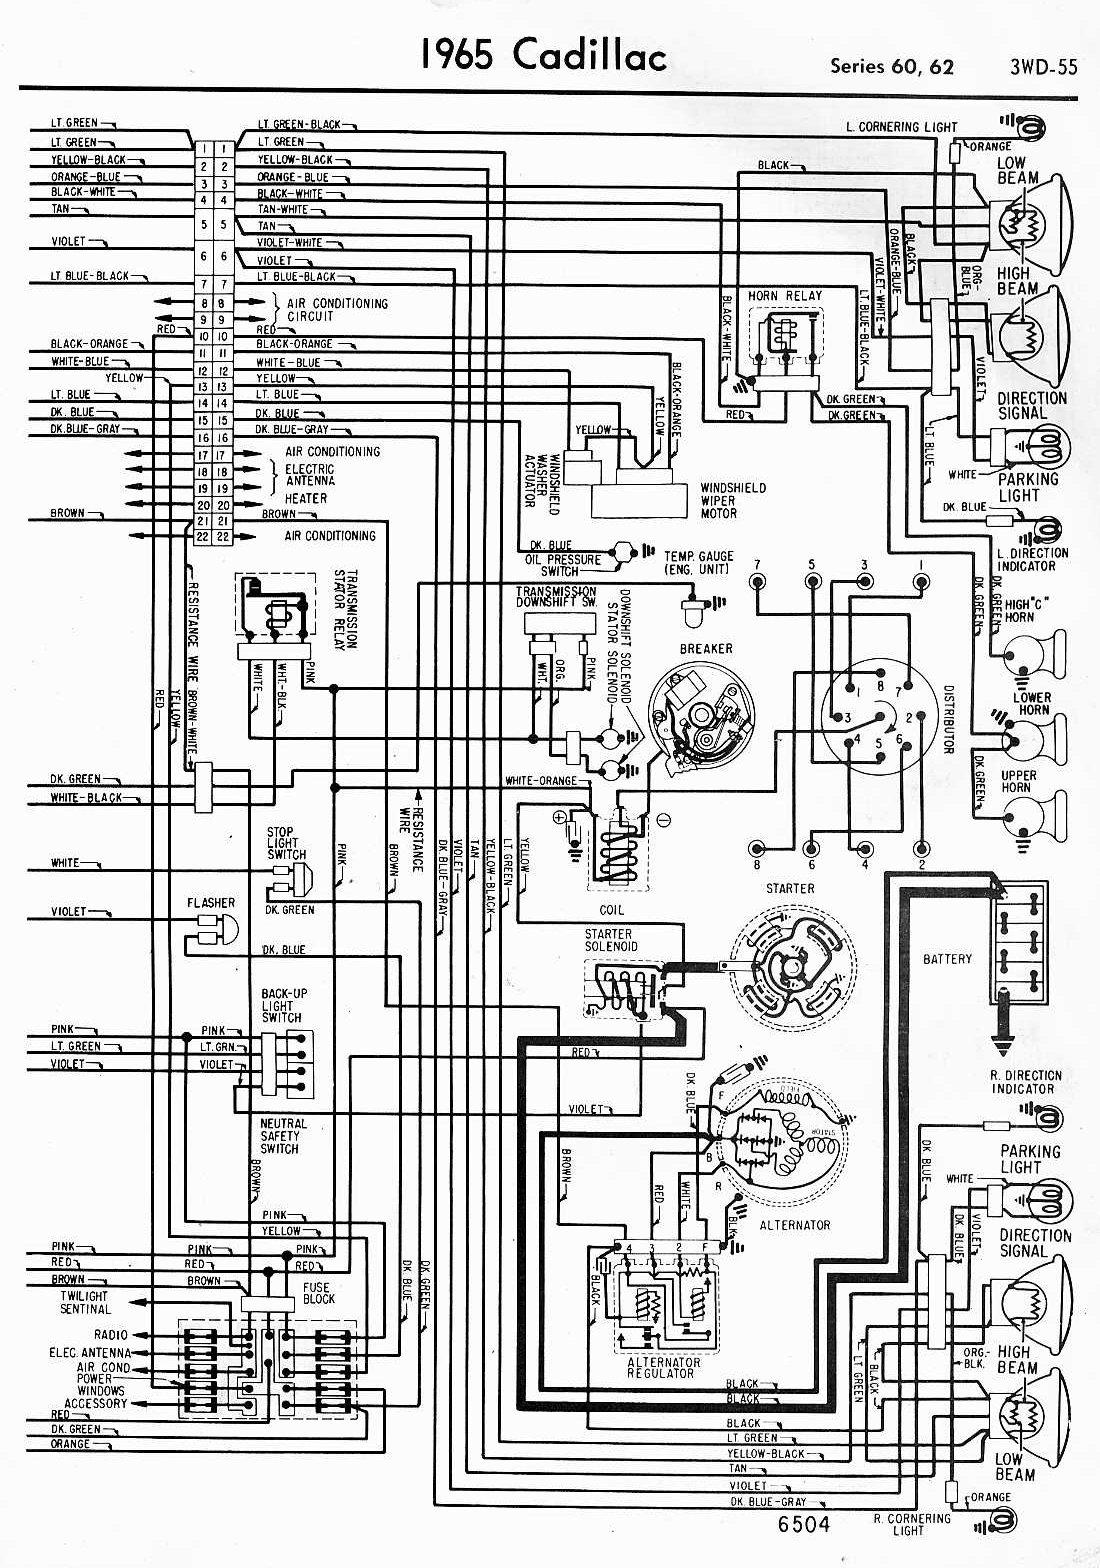 67 Cadillac Wiring Diagram Trusted Diagrams 1964 Schematic Wire Data Schema U2022 1977 Seville Headlight